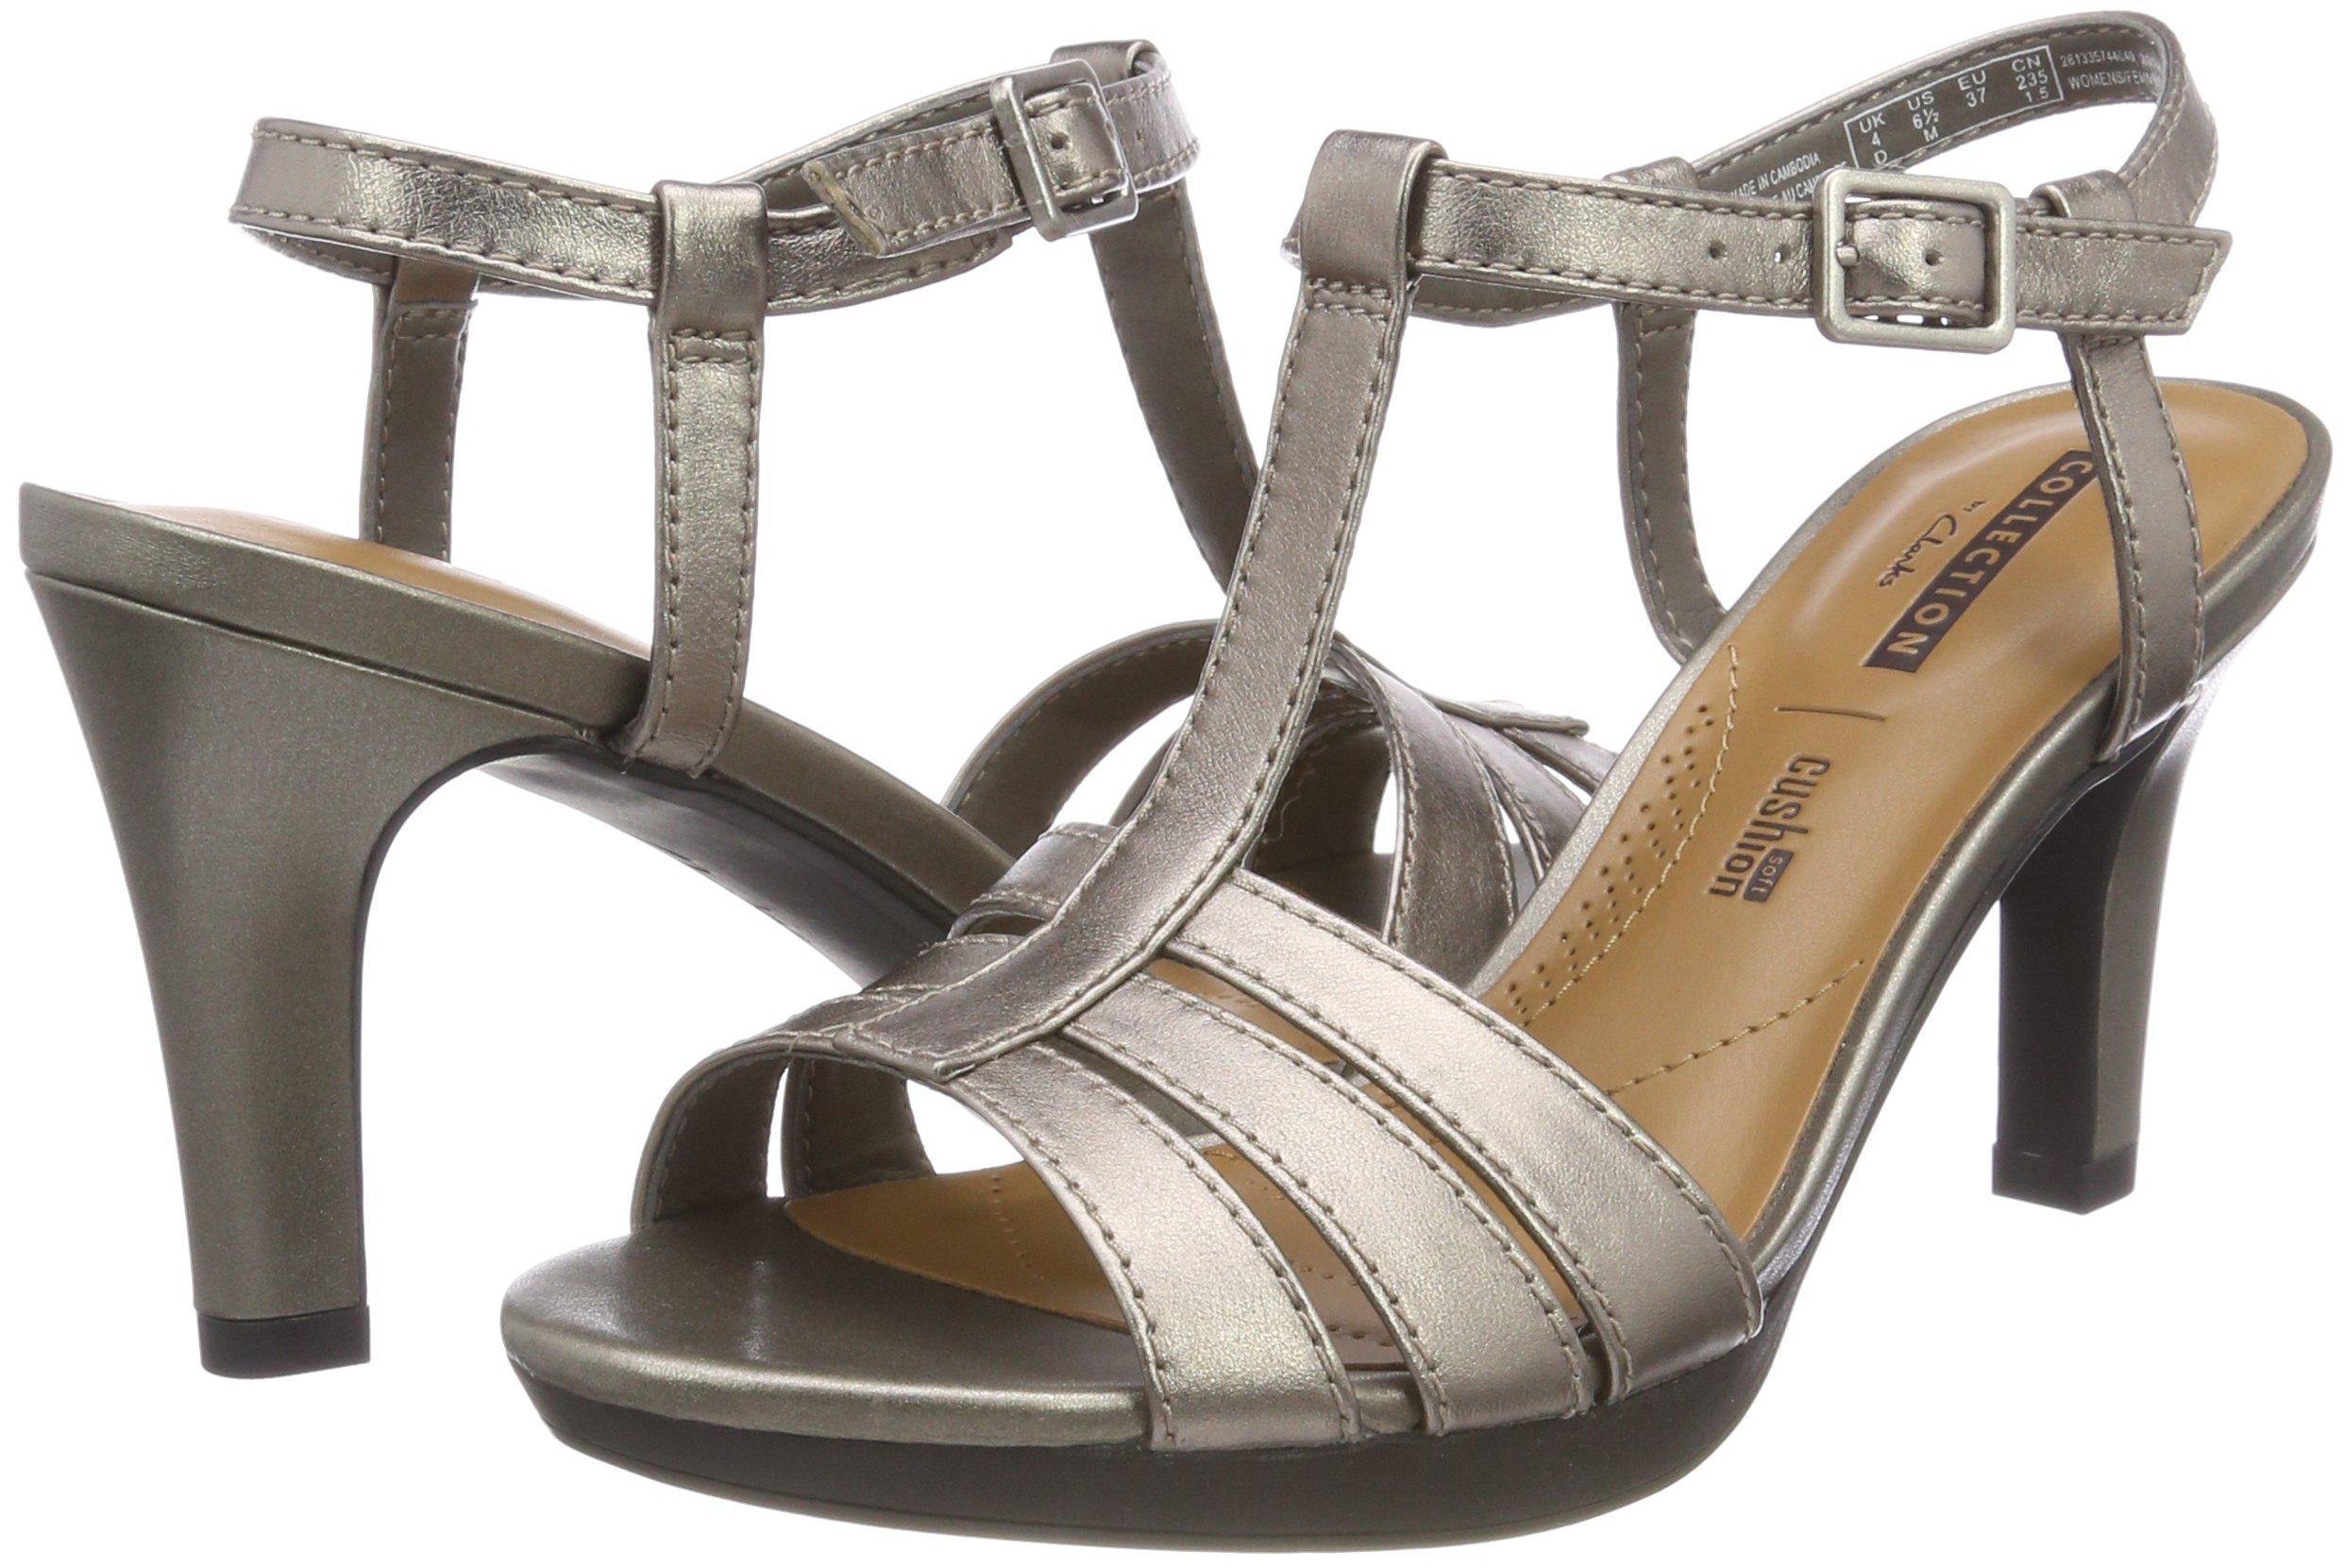 63a620680a6b Clarks Women s Adriel Tevis Fashion Sandals - Gia Designer